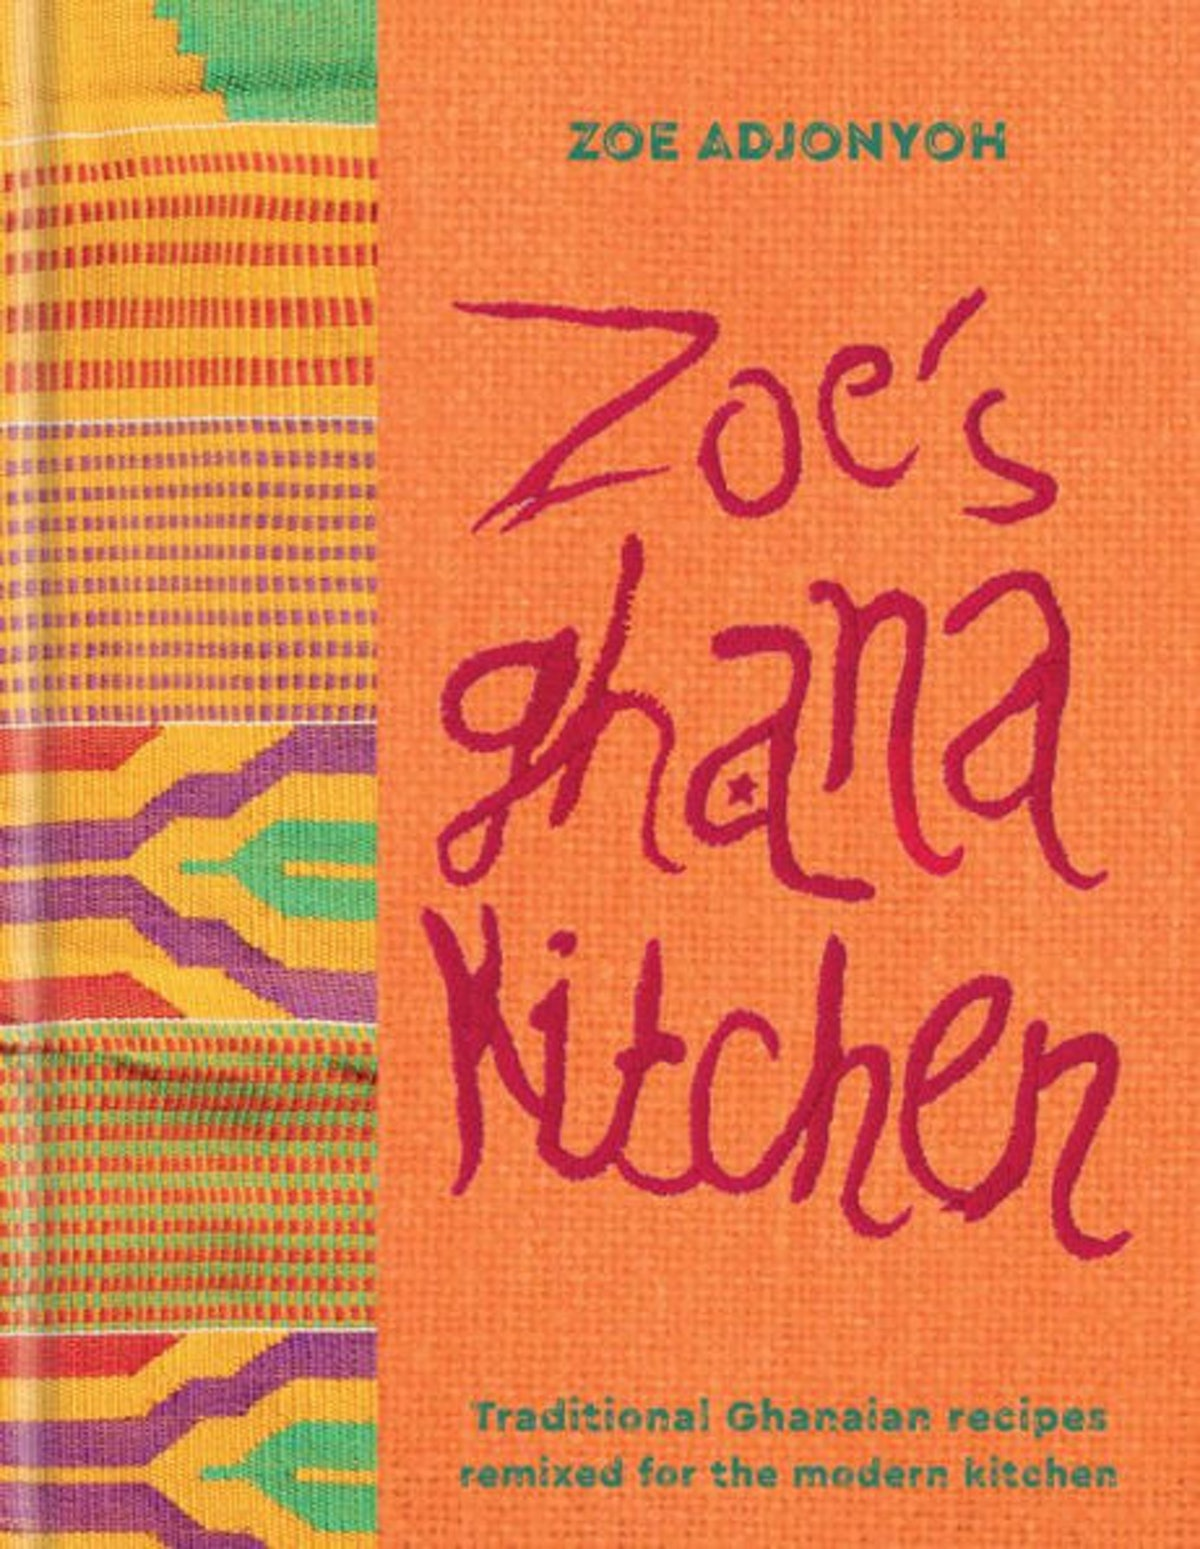 'Zoe's Ghana Kitchen' by Zoe Adjonyoh